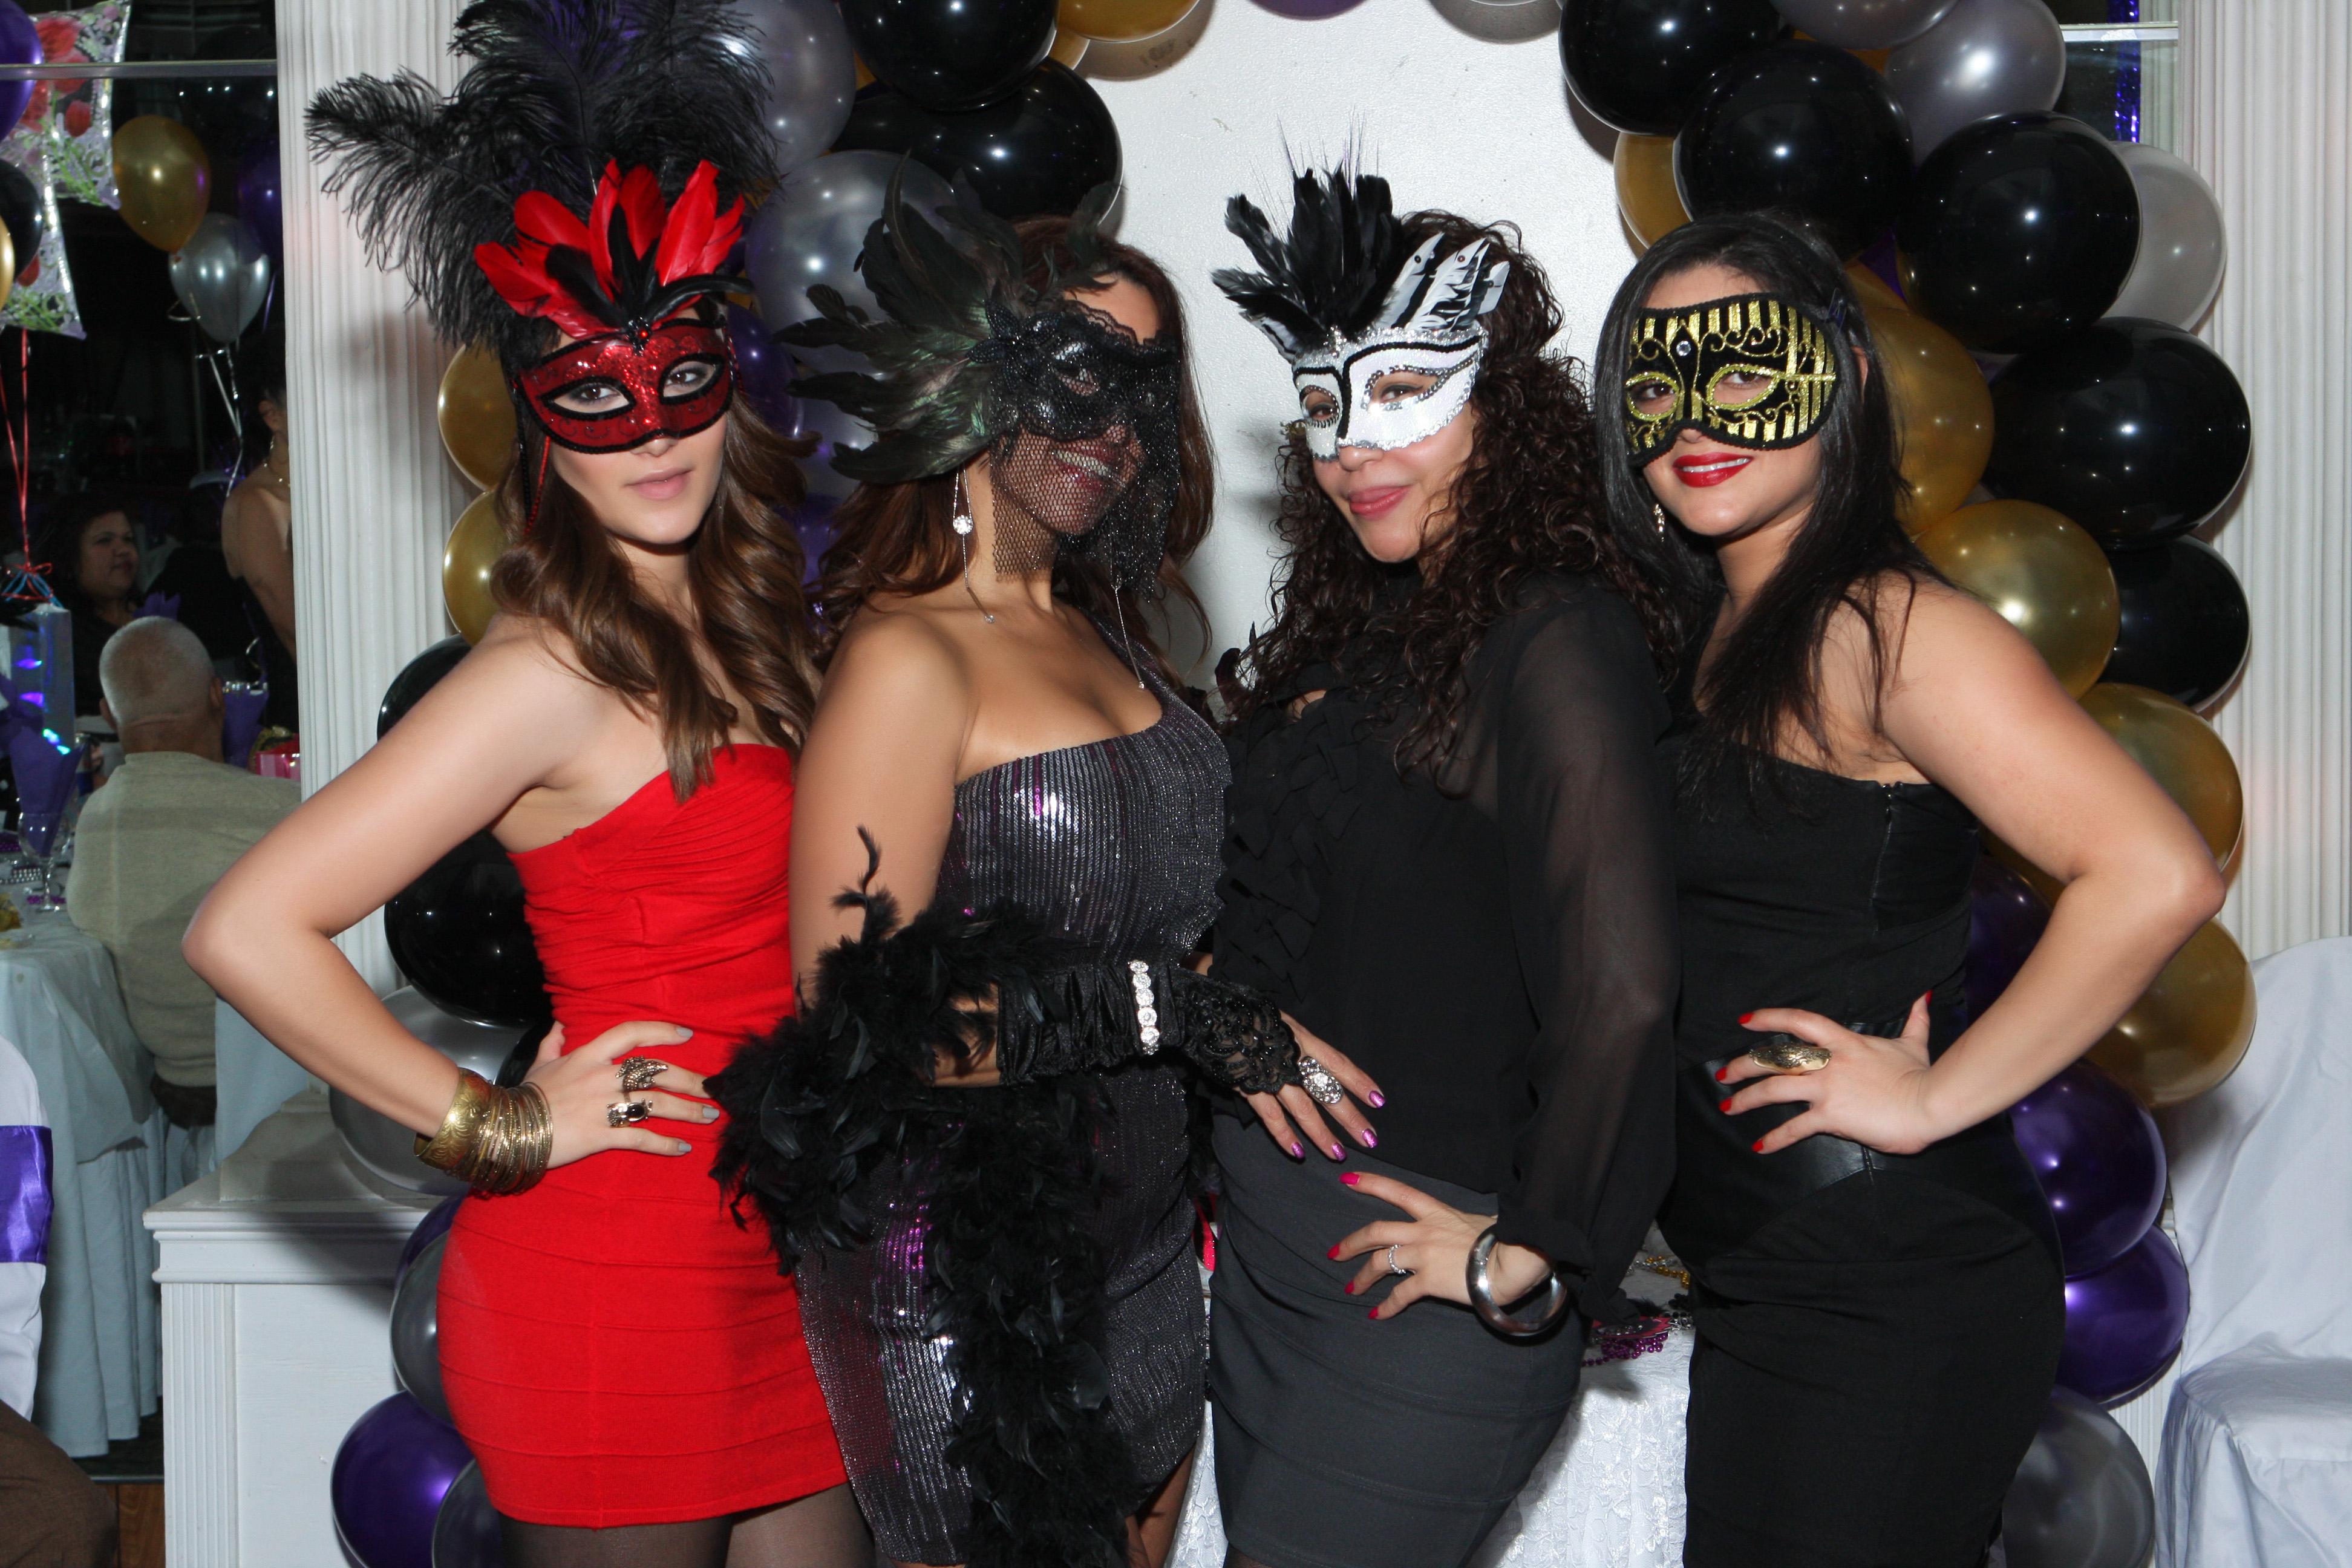 Masquerade Birthday Party Supplies - Party Supplies